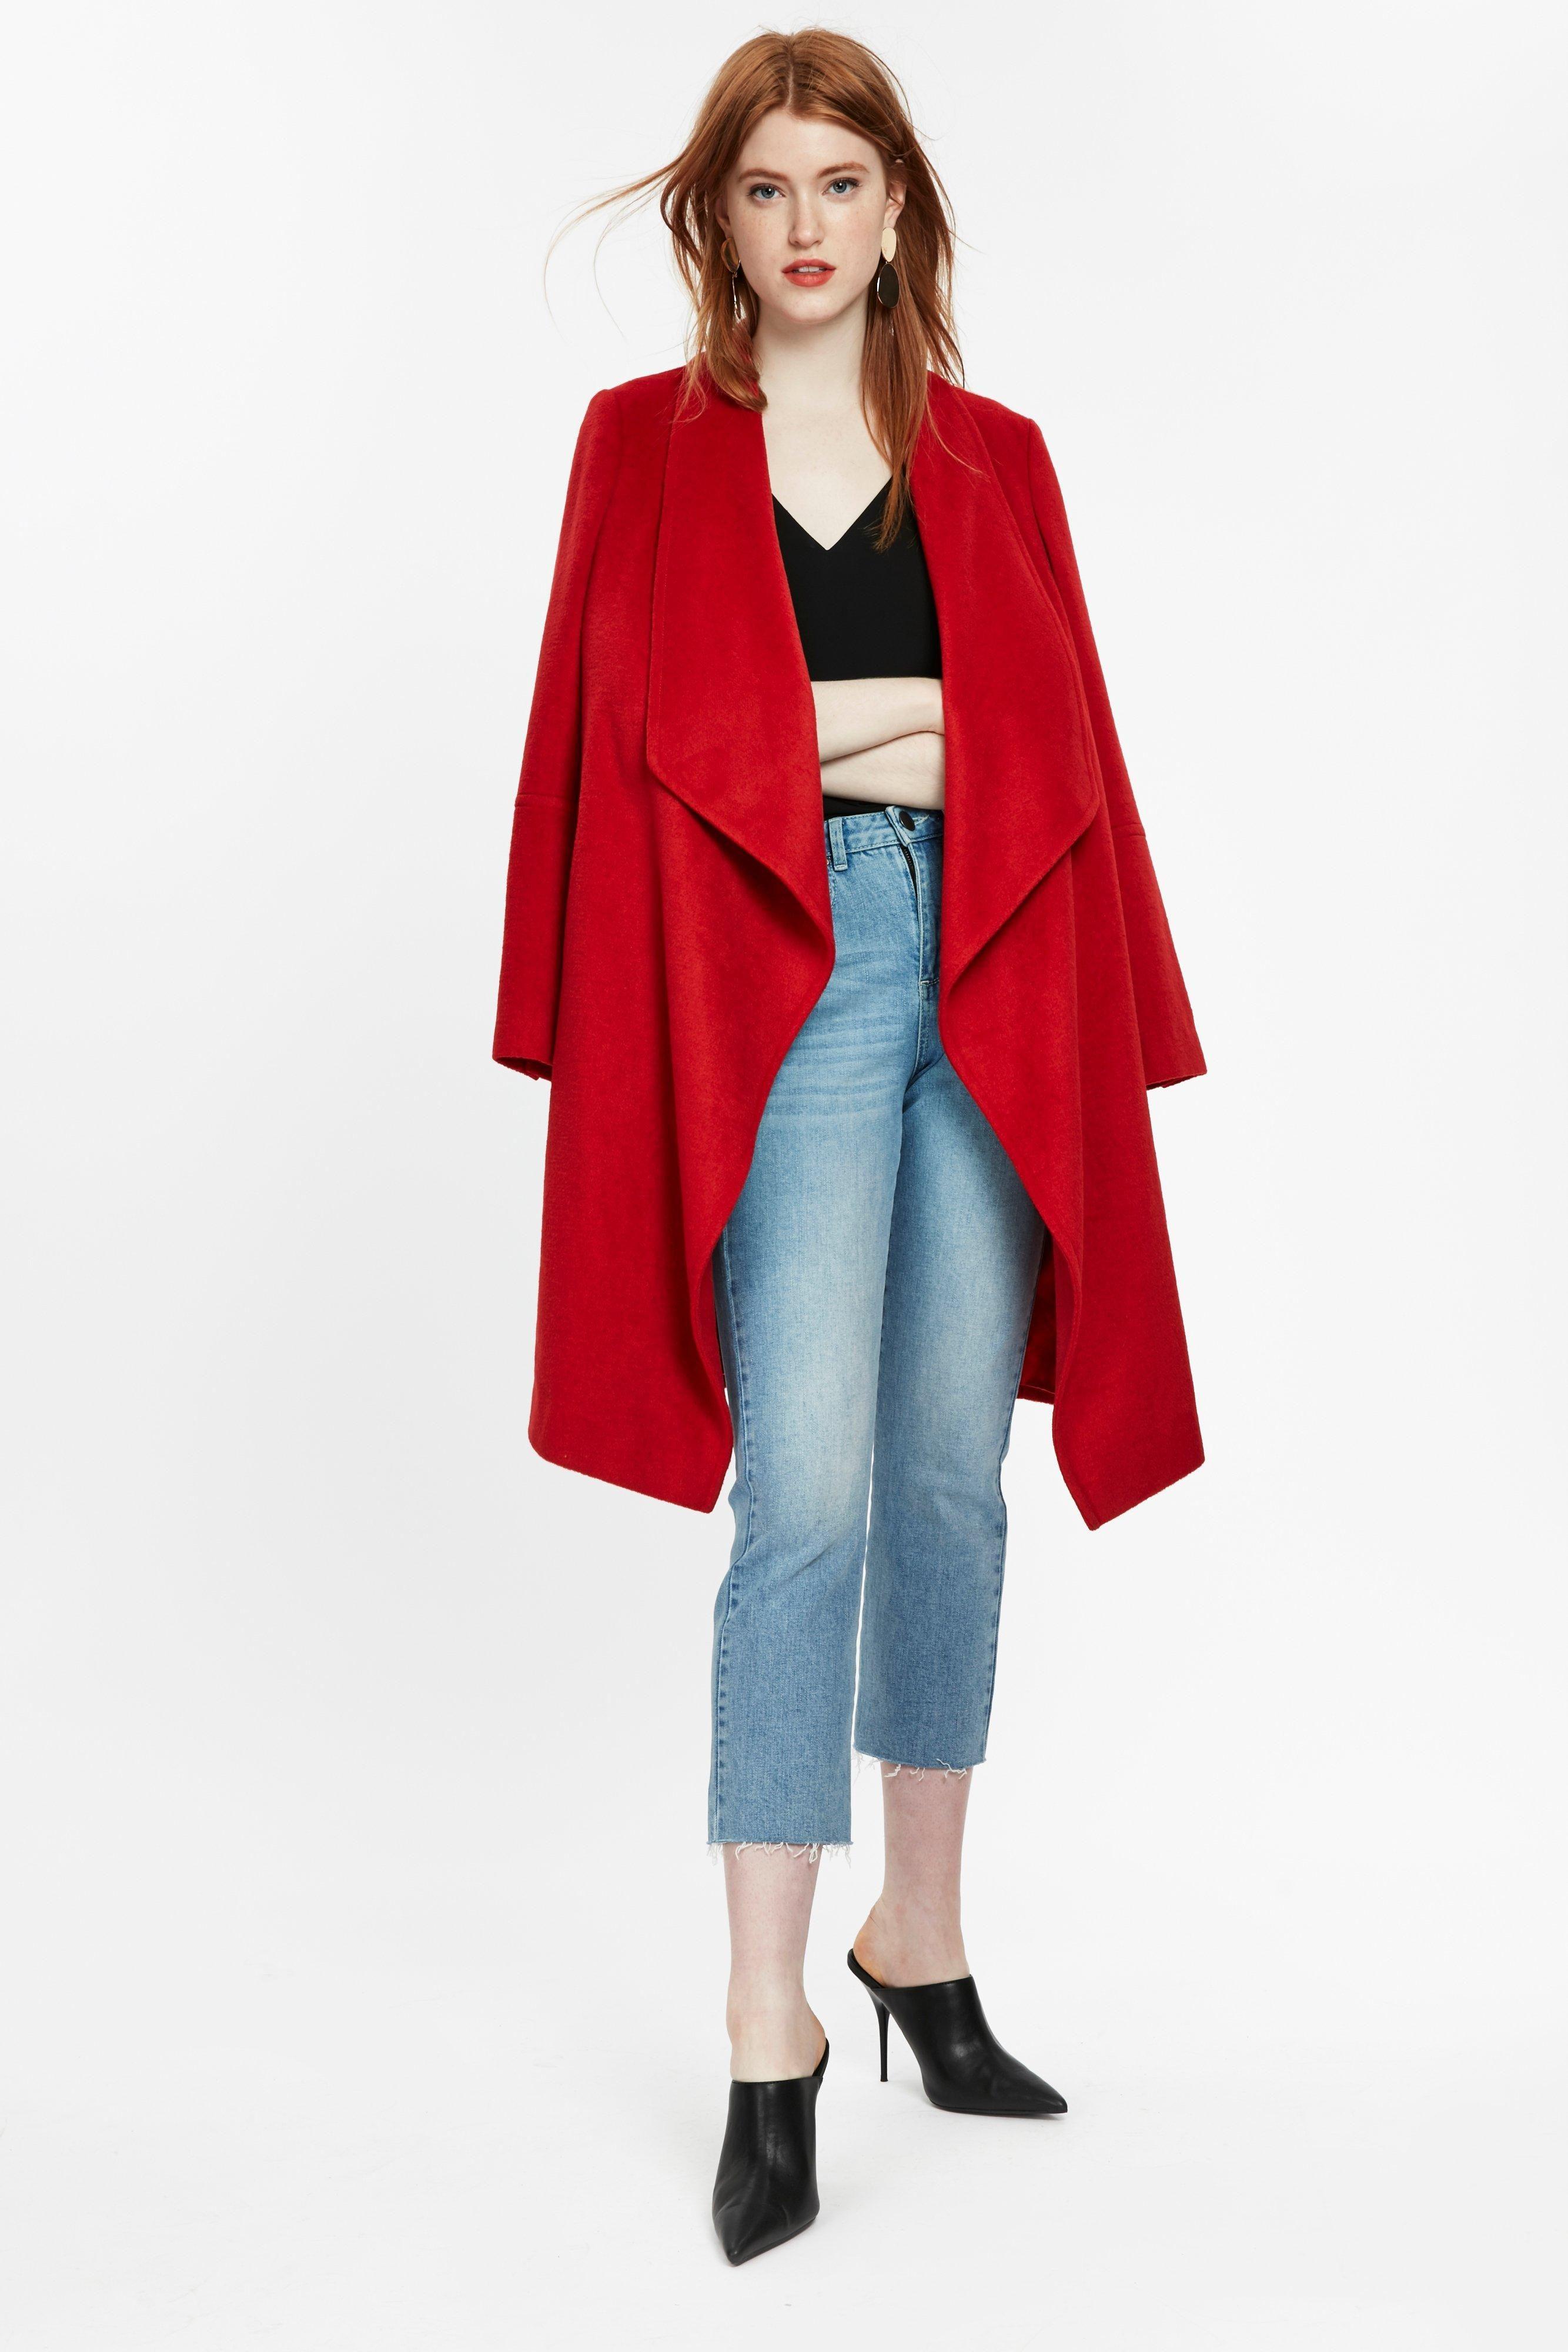 Red Stud Pocket Waterfall Coat | Coat, Waterfall coat, Red ...